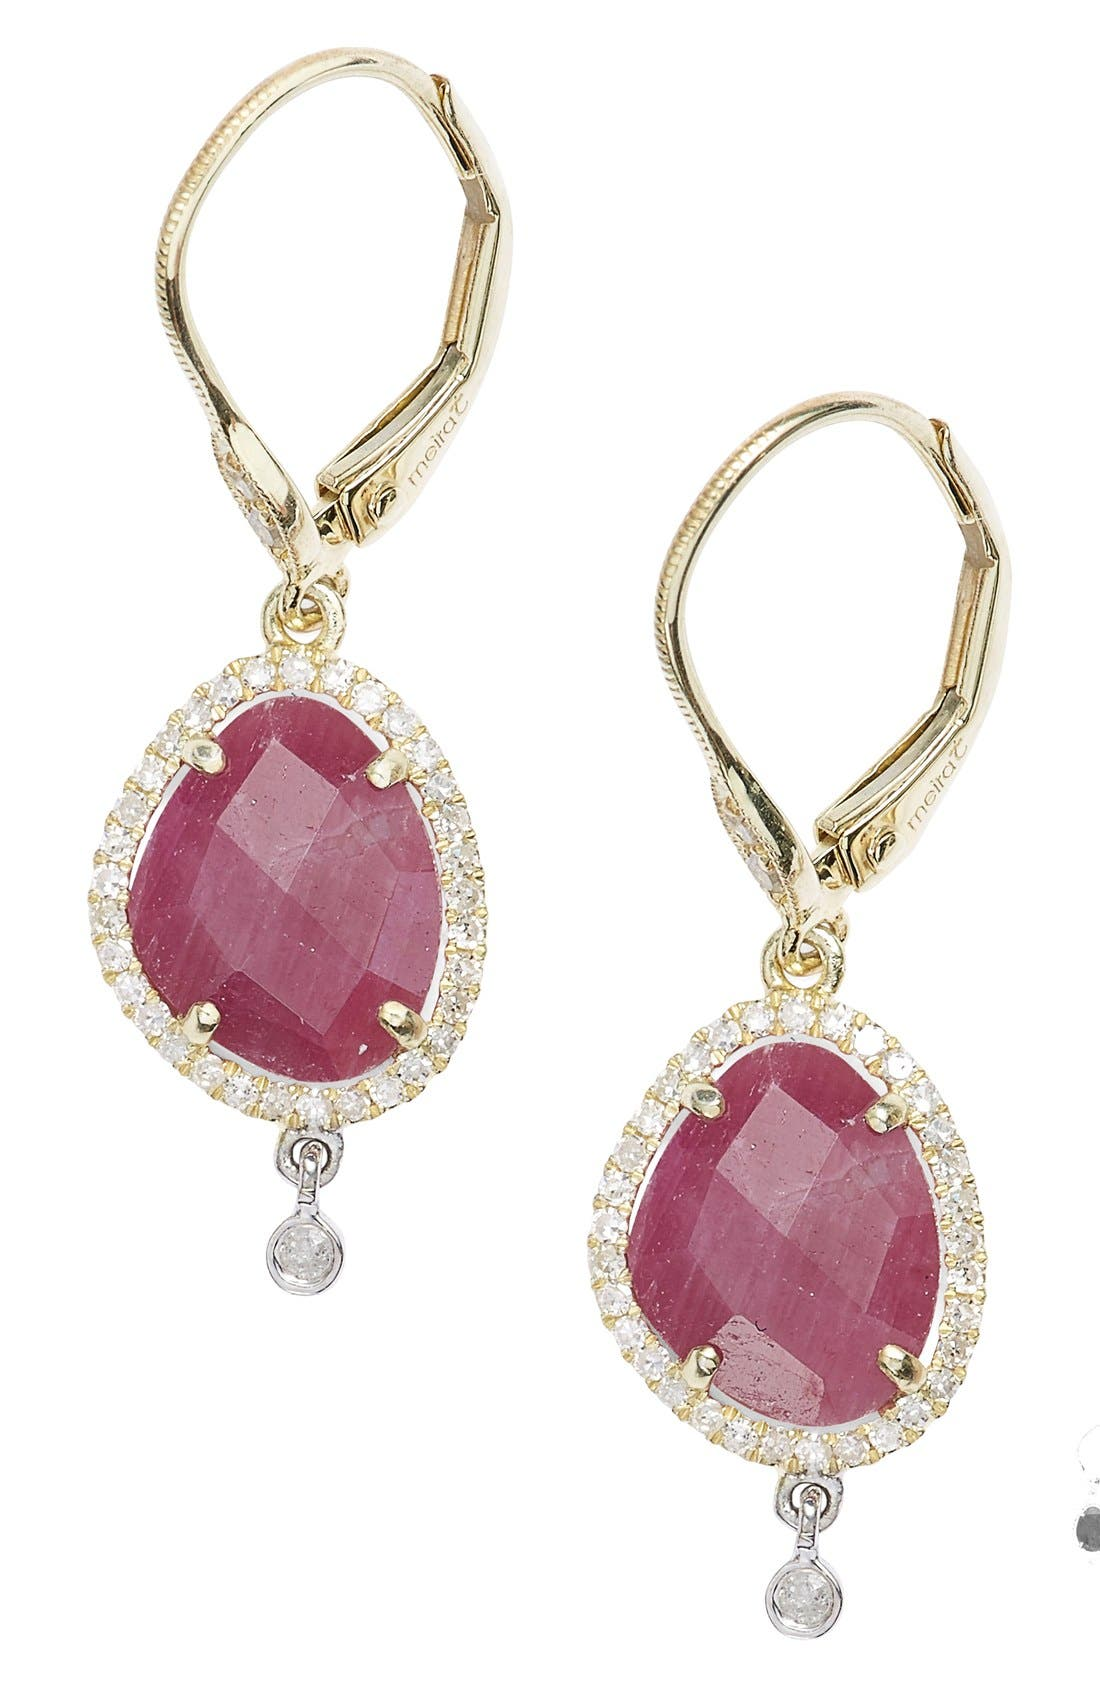 Main Image - Meira T Diamond & Semiprecious Stone Drop Earrings